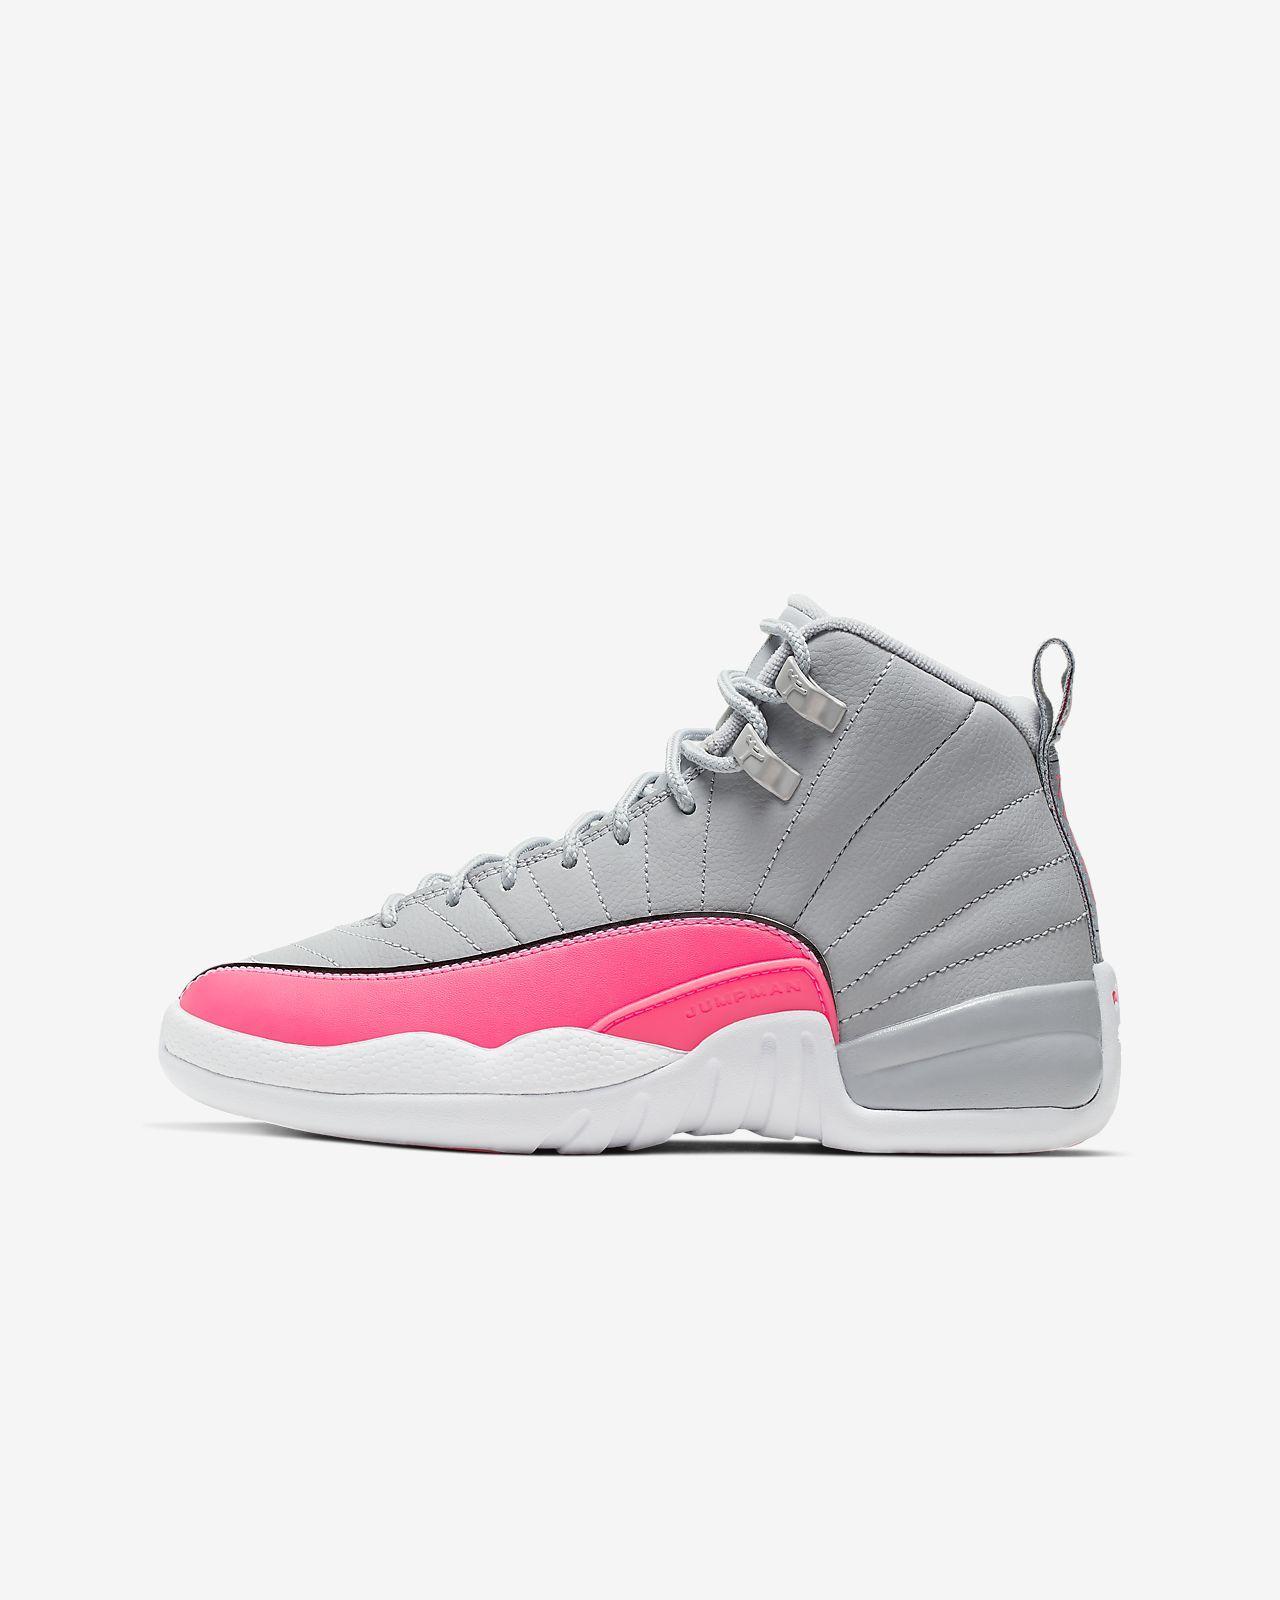 Air jordans, Kids' shoes, Nike shoes girls